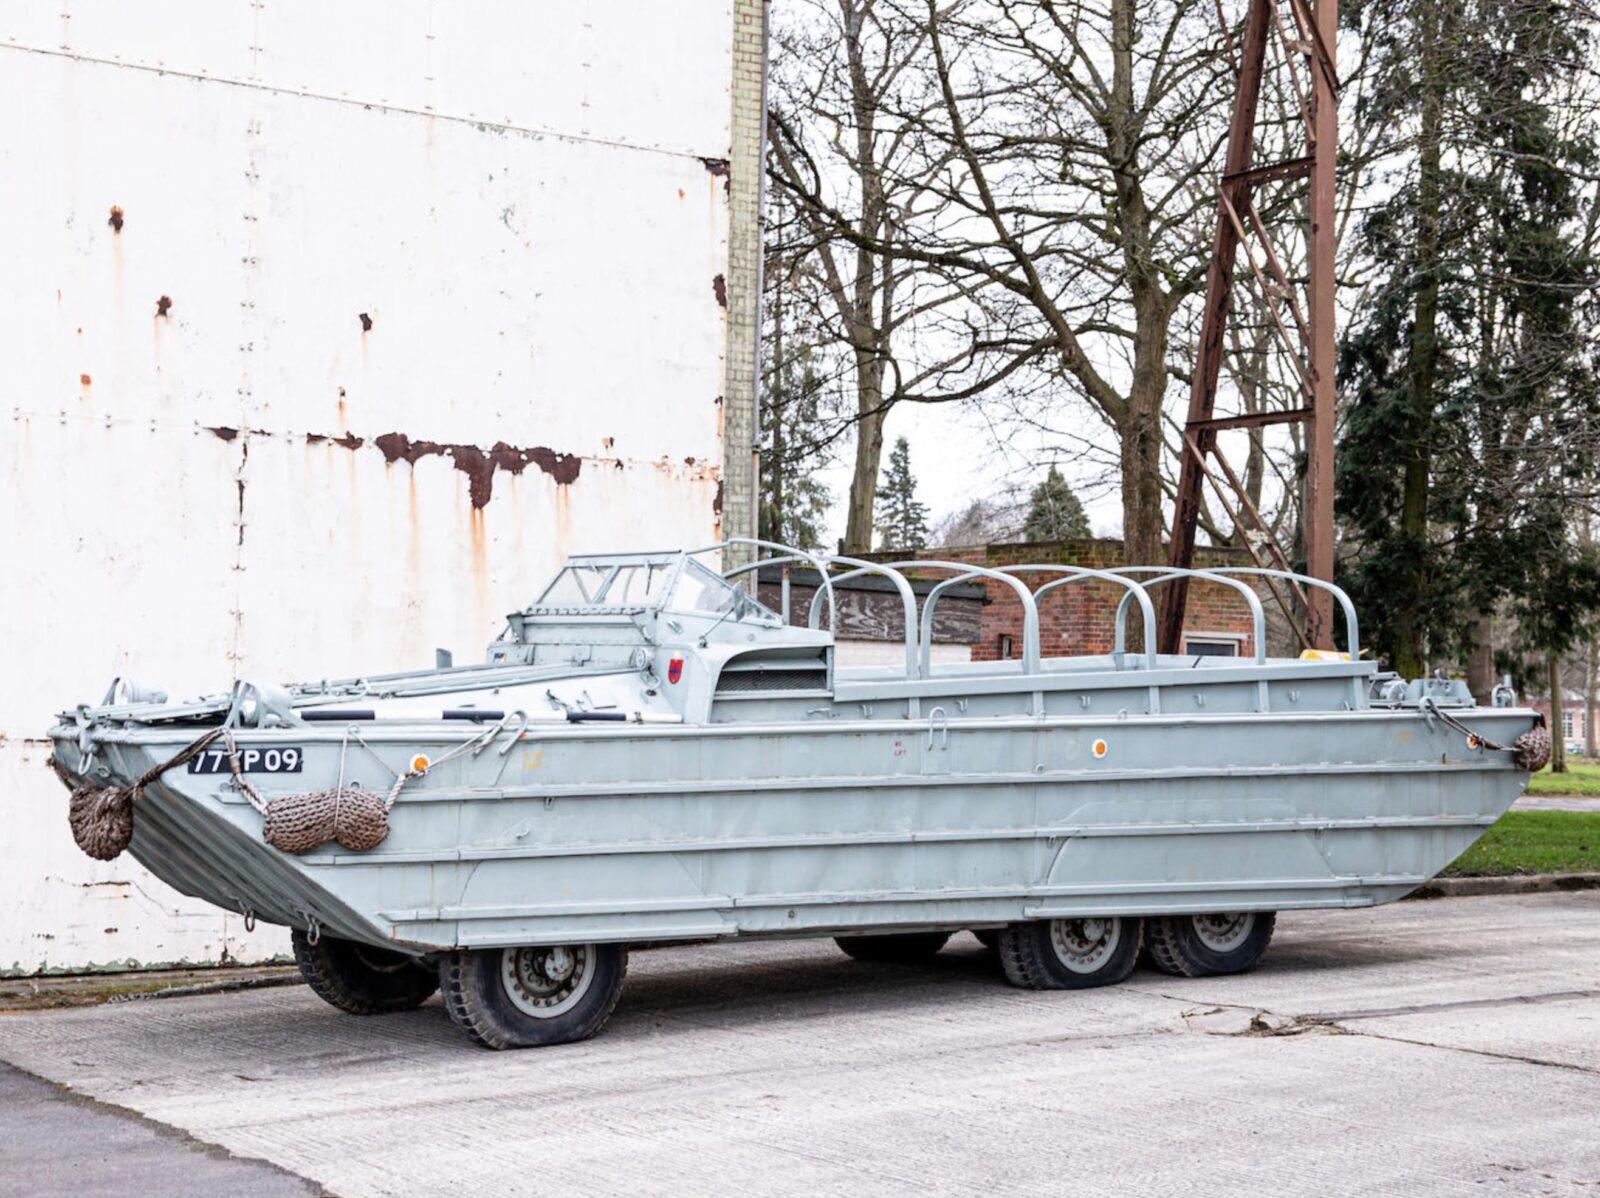 GMC DUKW Amphibious Landing Craft